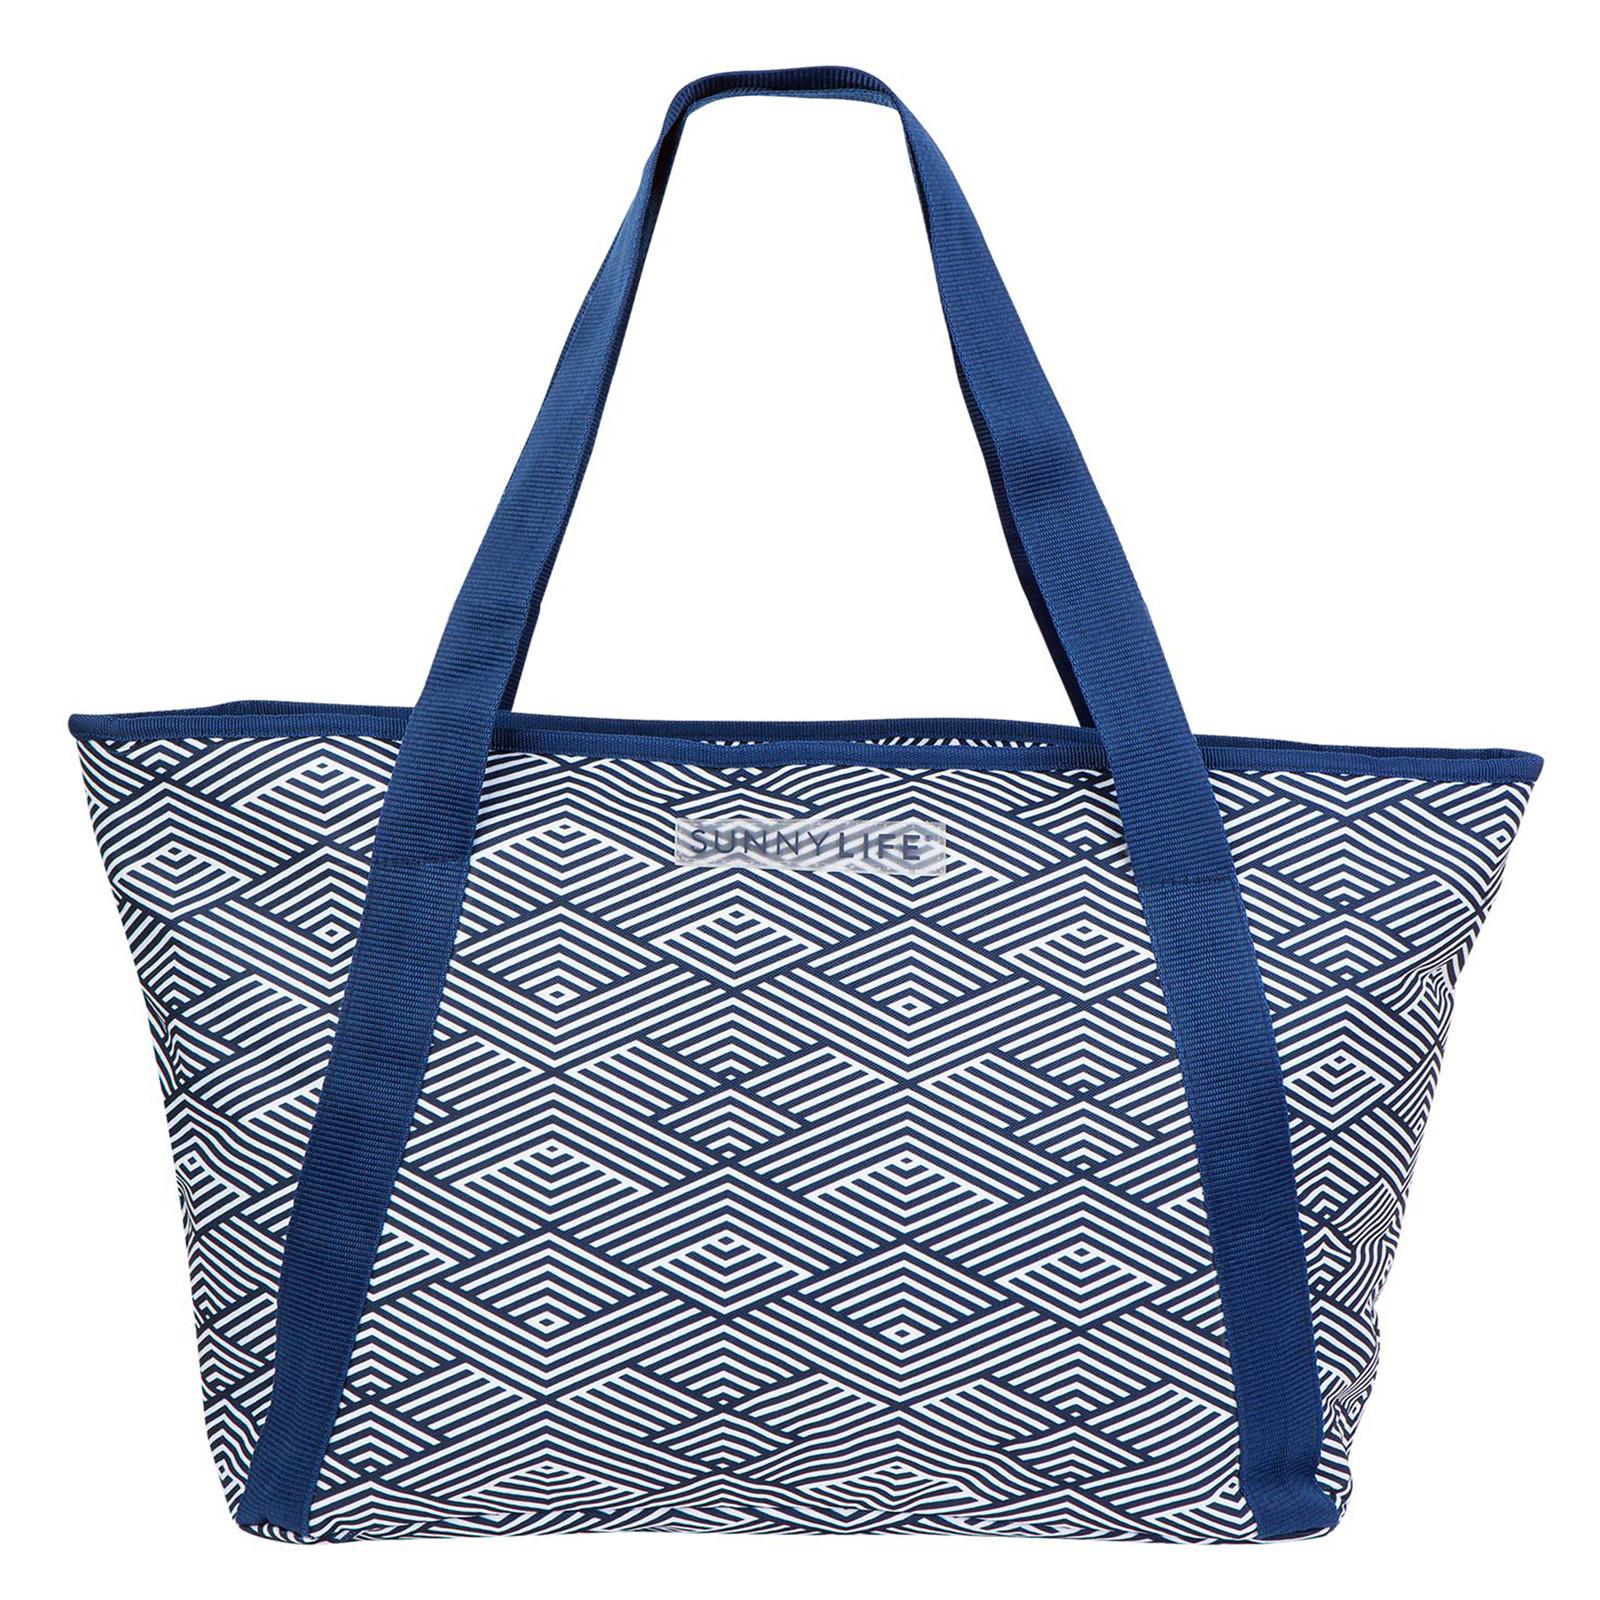 picnic navy blue printed beach cool bag cooler bag montauk. Black Bedroom Furniture Sets. Home Design Ideas